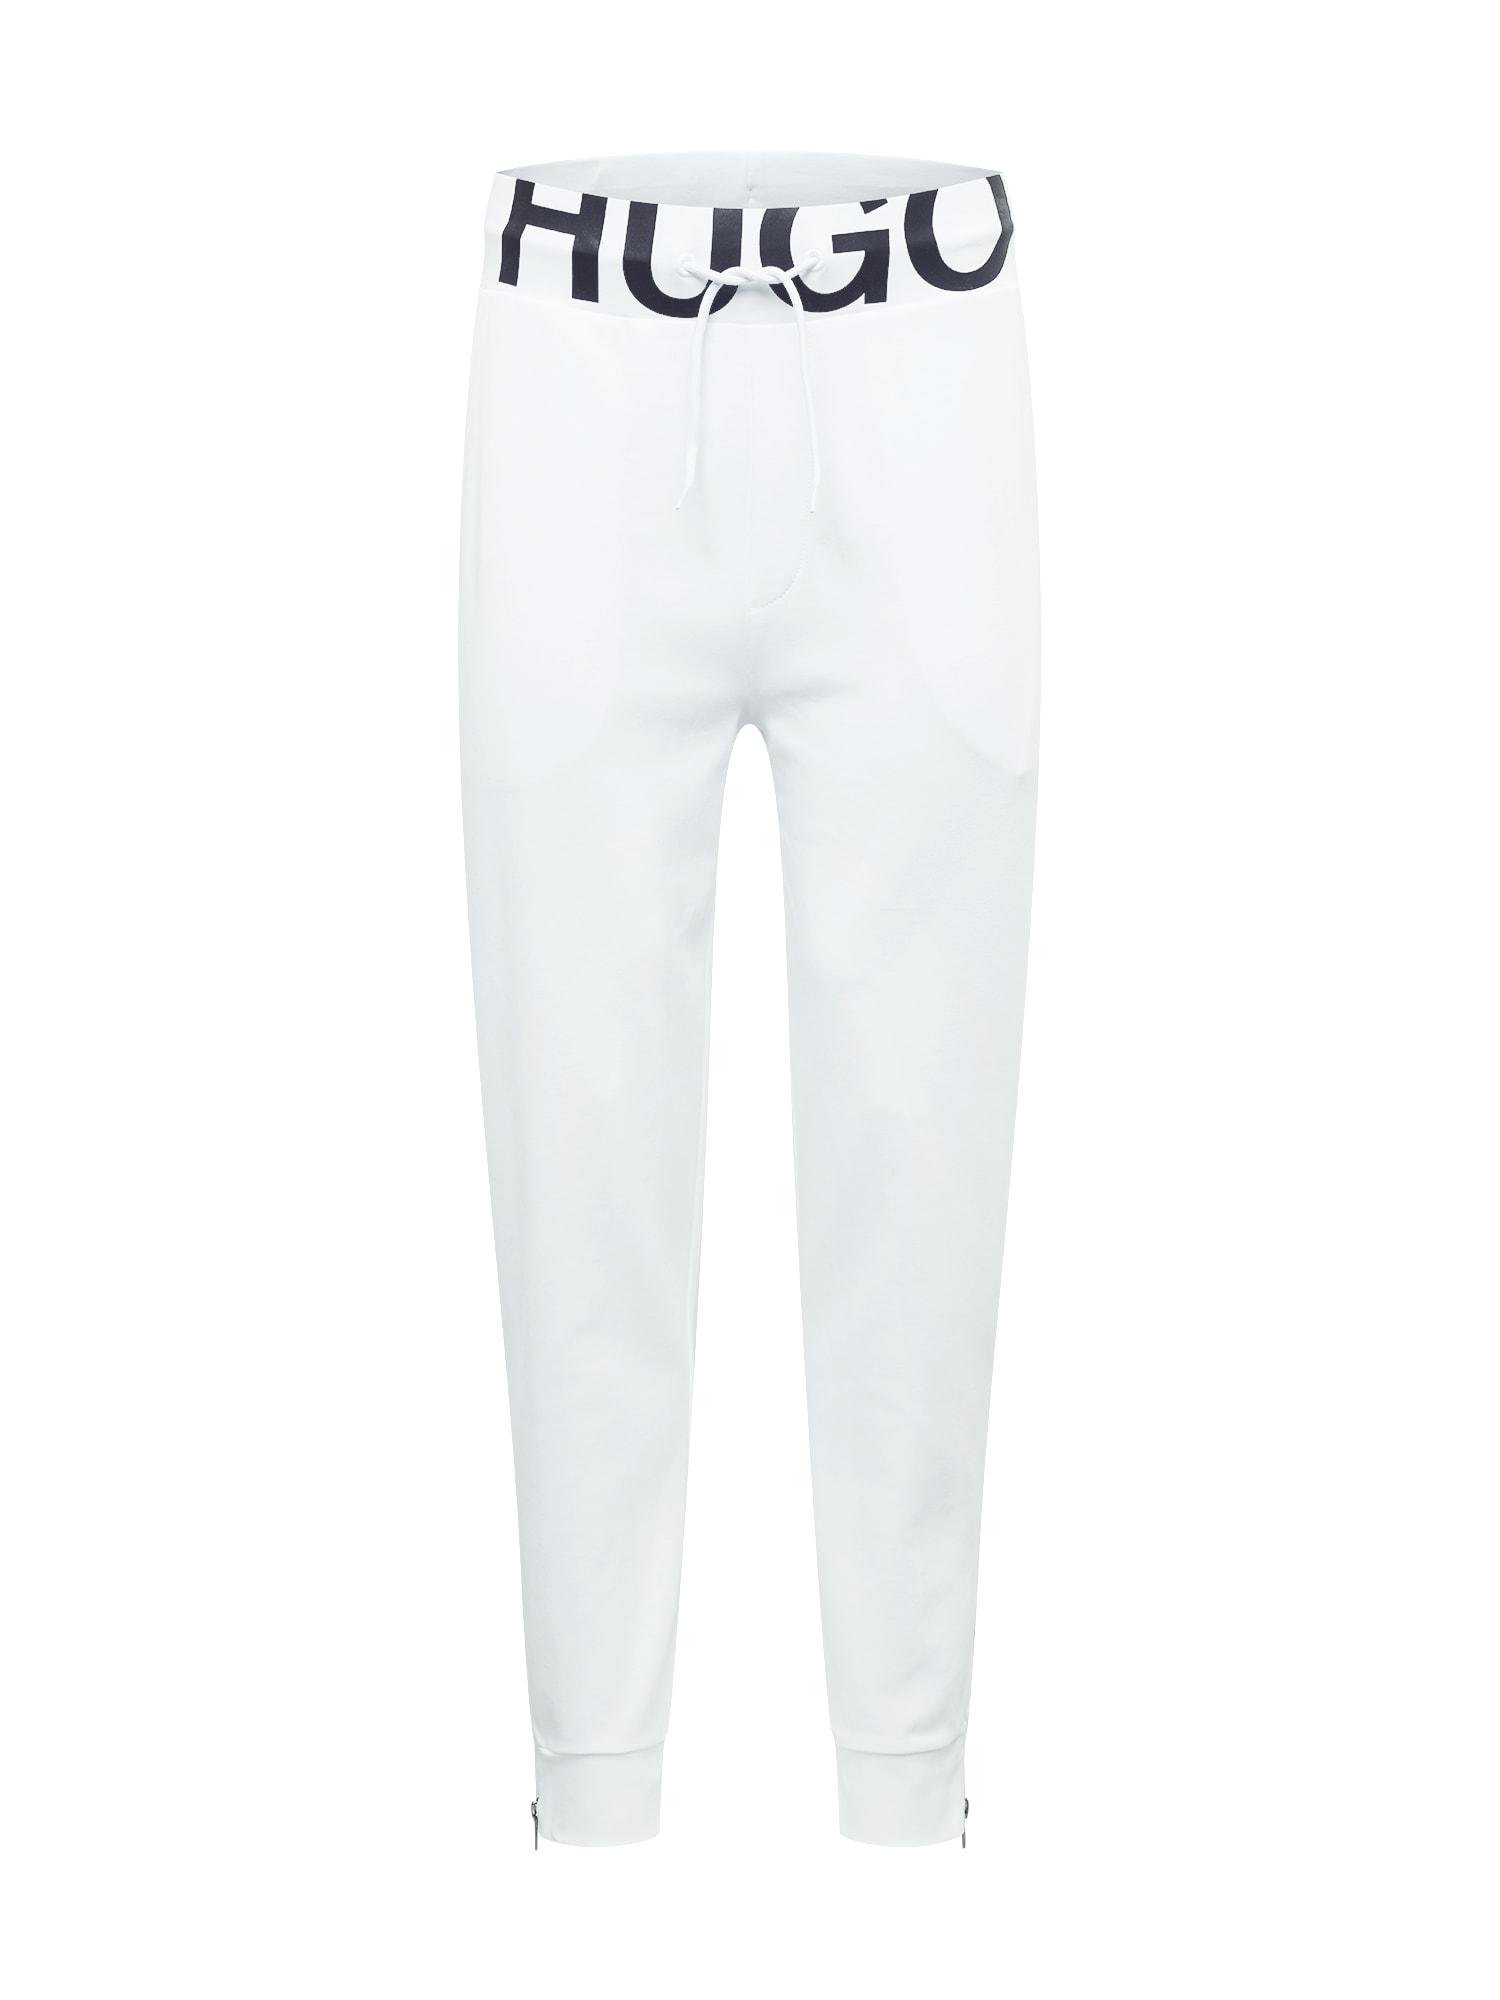 HUGO Sportovní kalhoty 'DUROS211'  bílá / černá